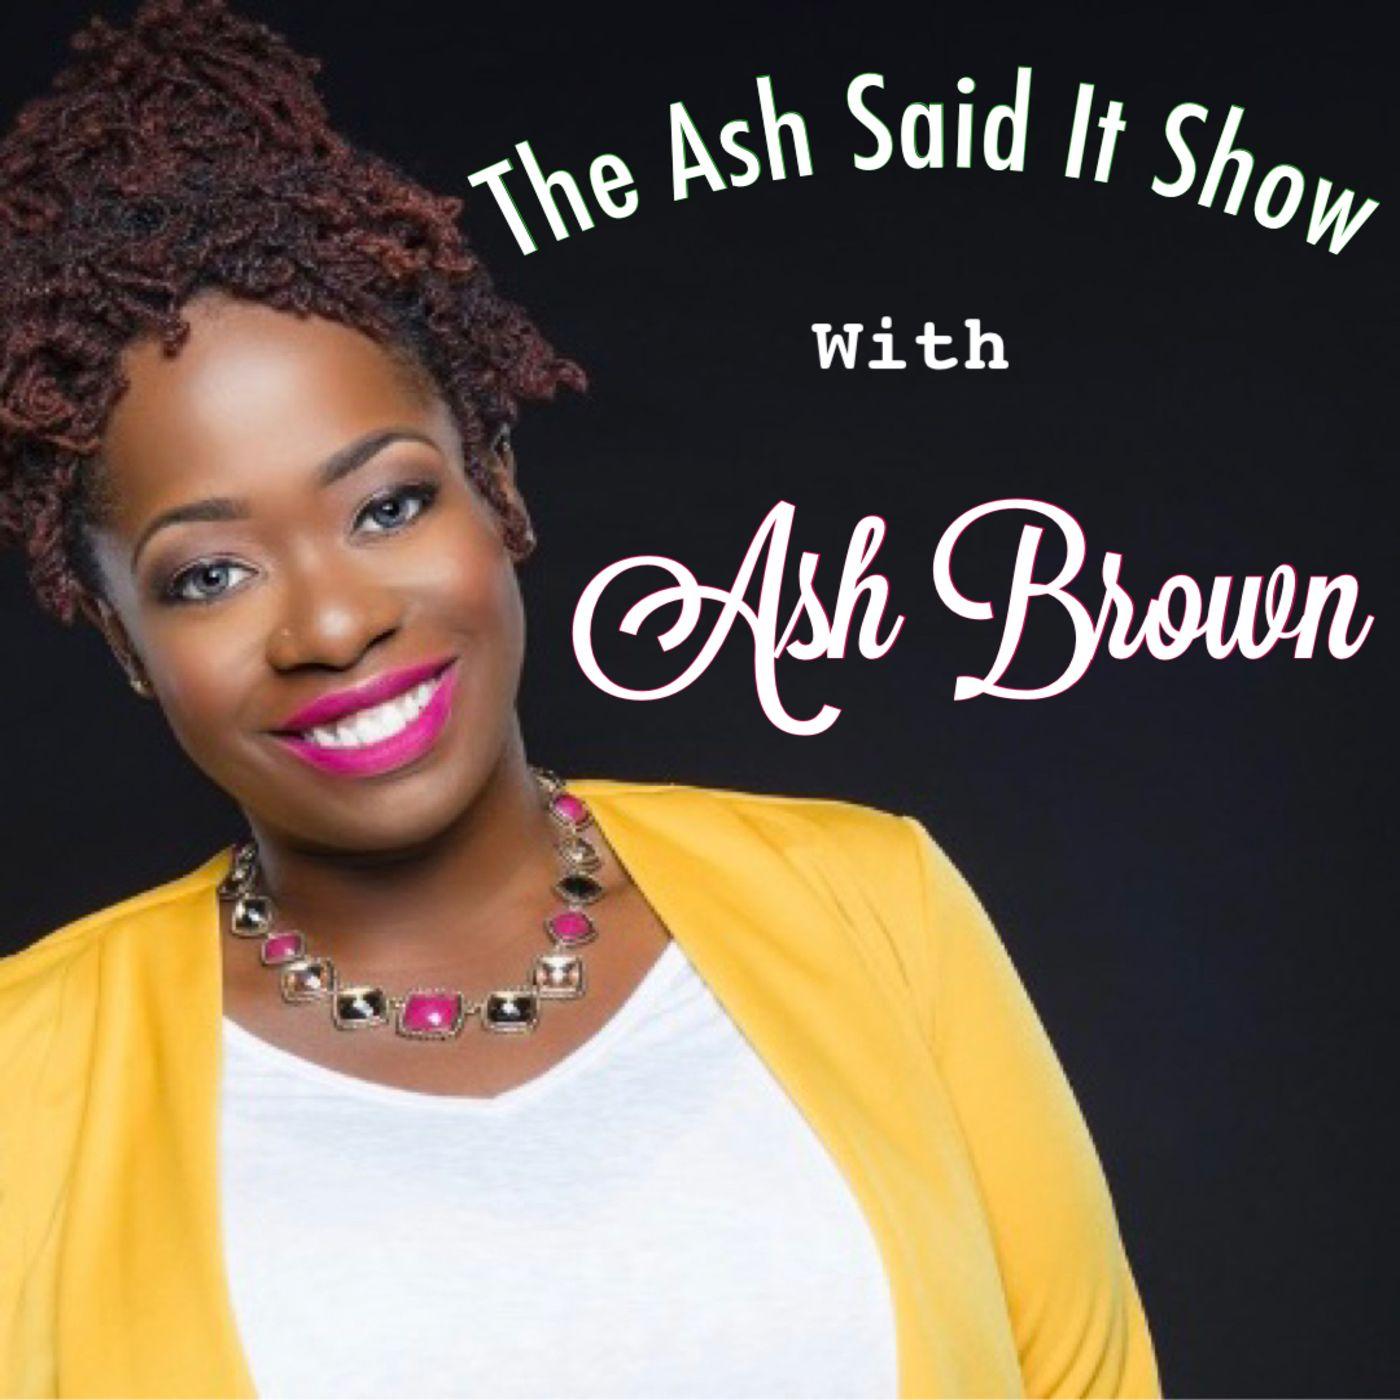 The Ash Said It Show